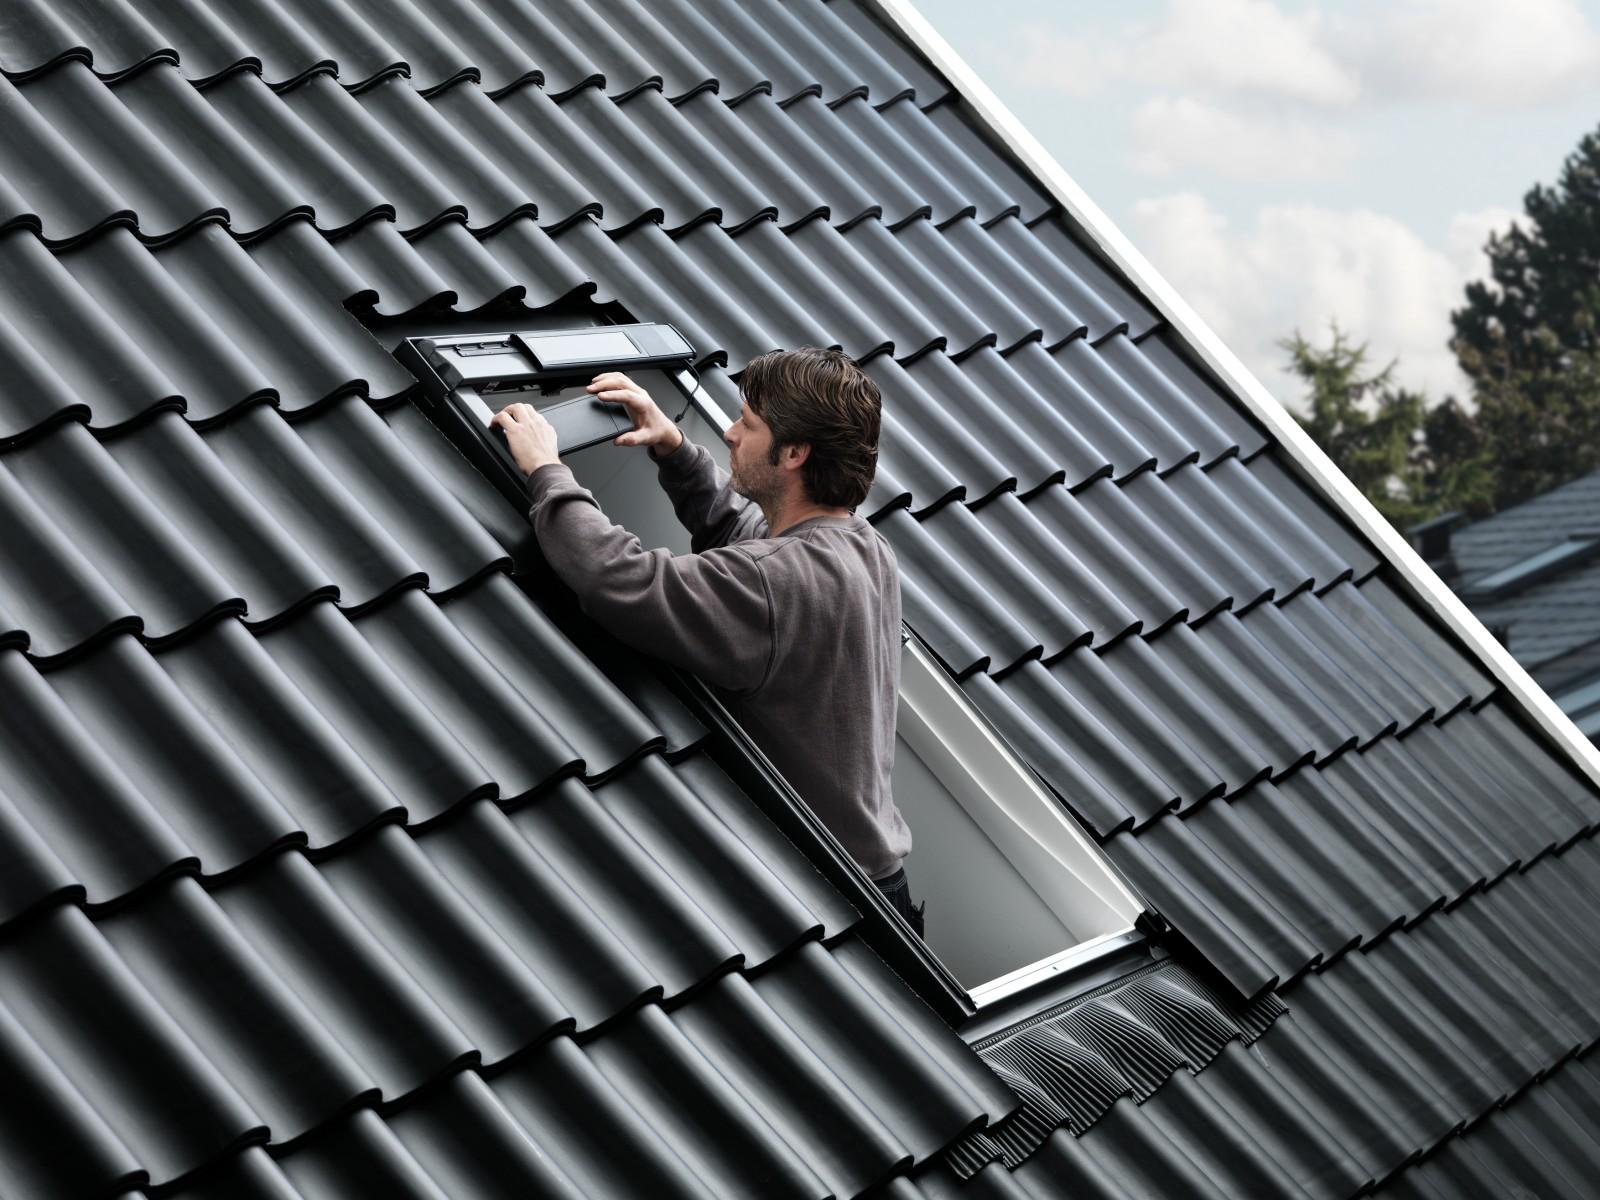 Nouvelle Fenetre Velux Integra Solar